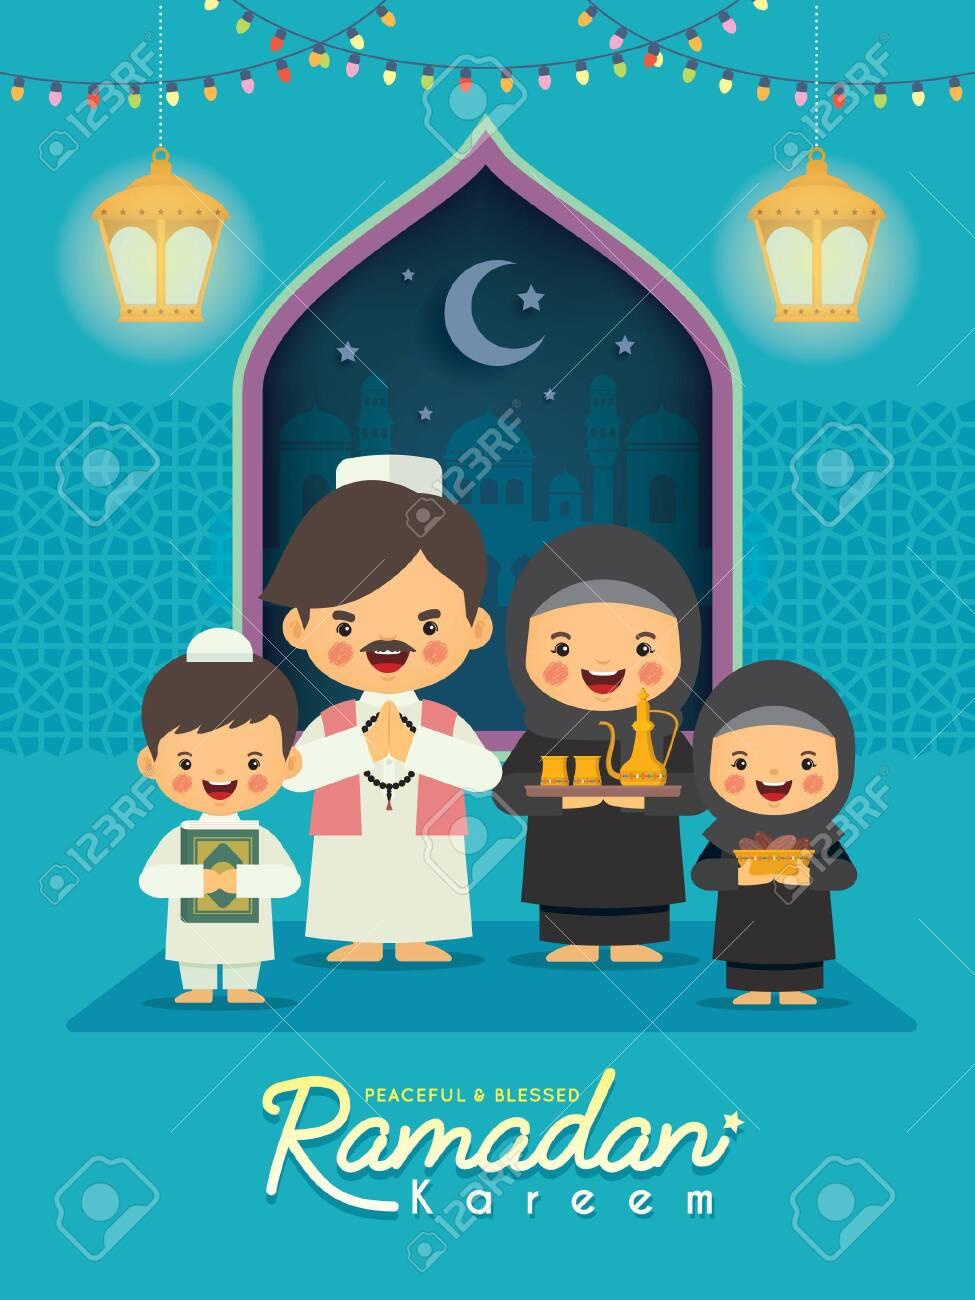 Ramadan Kareem Greeting Illustration. Cartoon Muslim Or Arabian.. Royalty  Free Cliparts, Vectors, And Stock Illustration. Image 145064375.